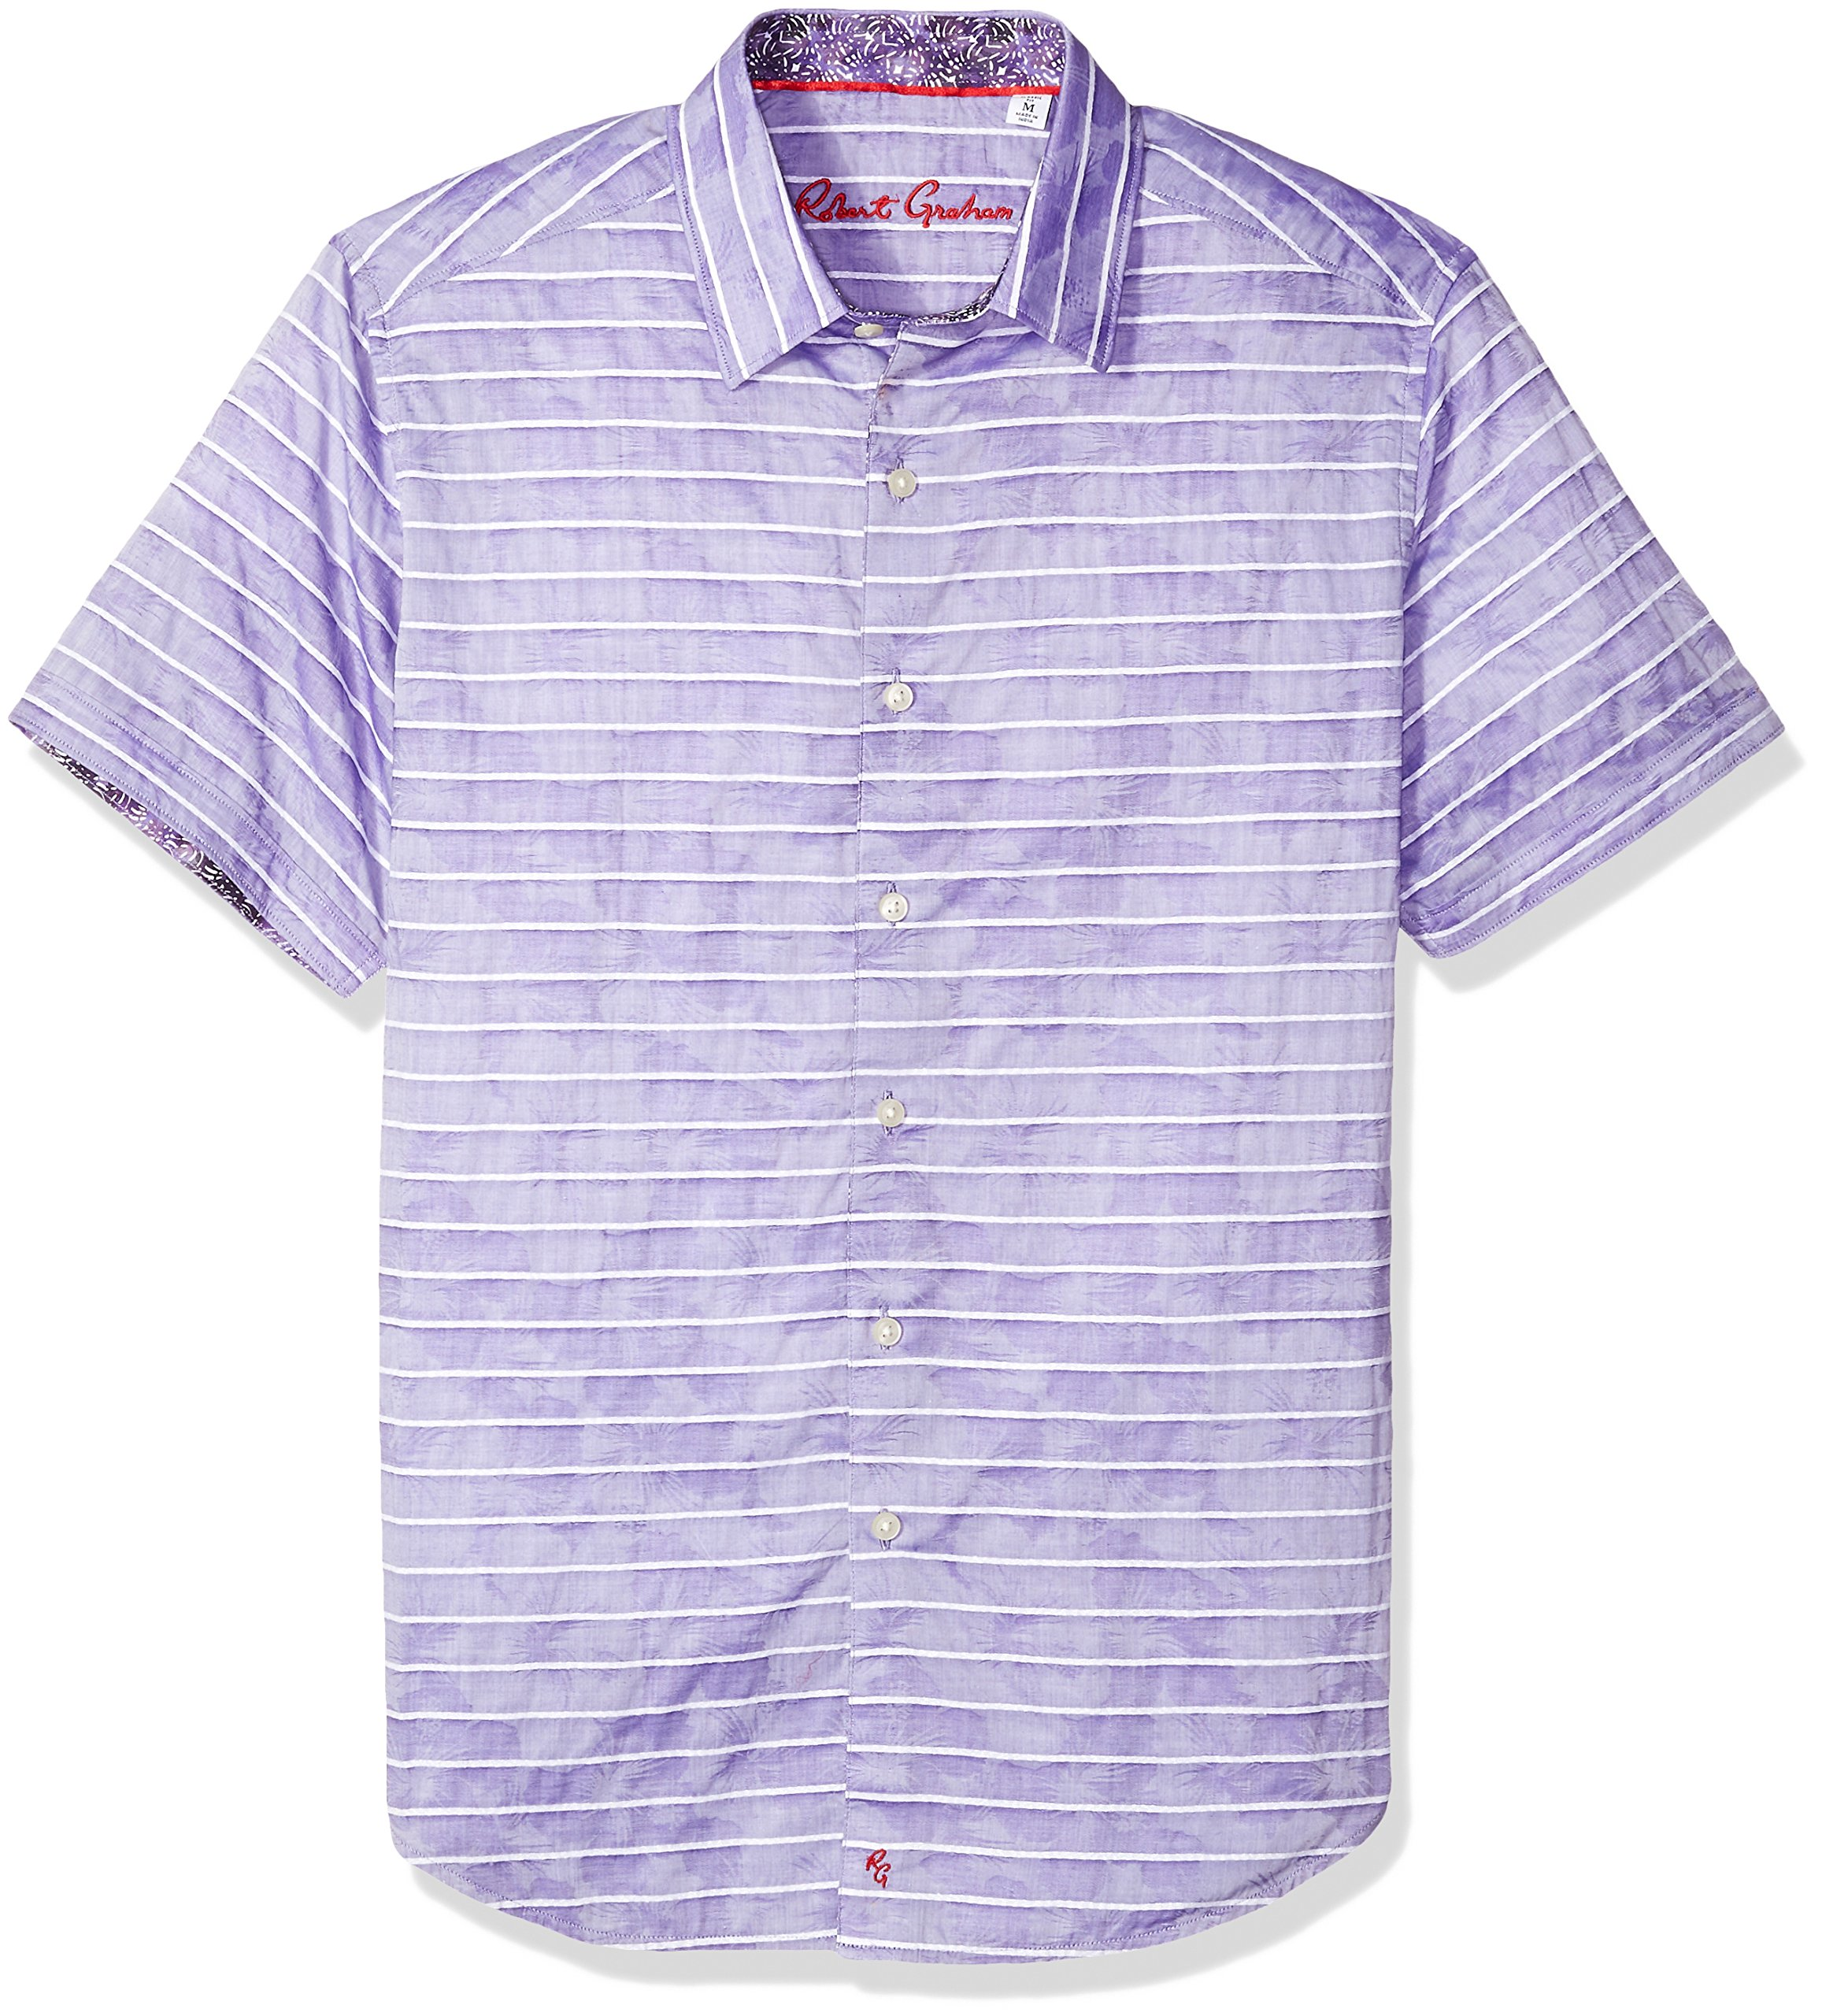 Robert Graham Men's AVENIDA Short Sleeve Shirt, Purple, Large by Robert Graham (Image #1)